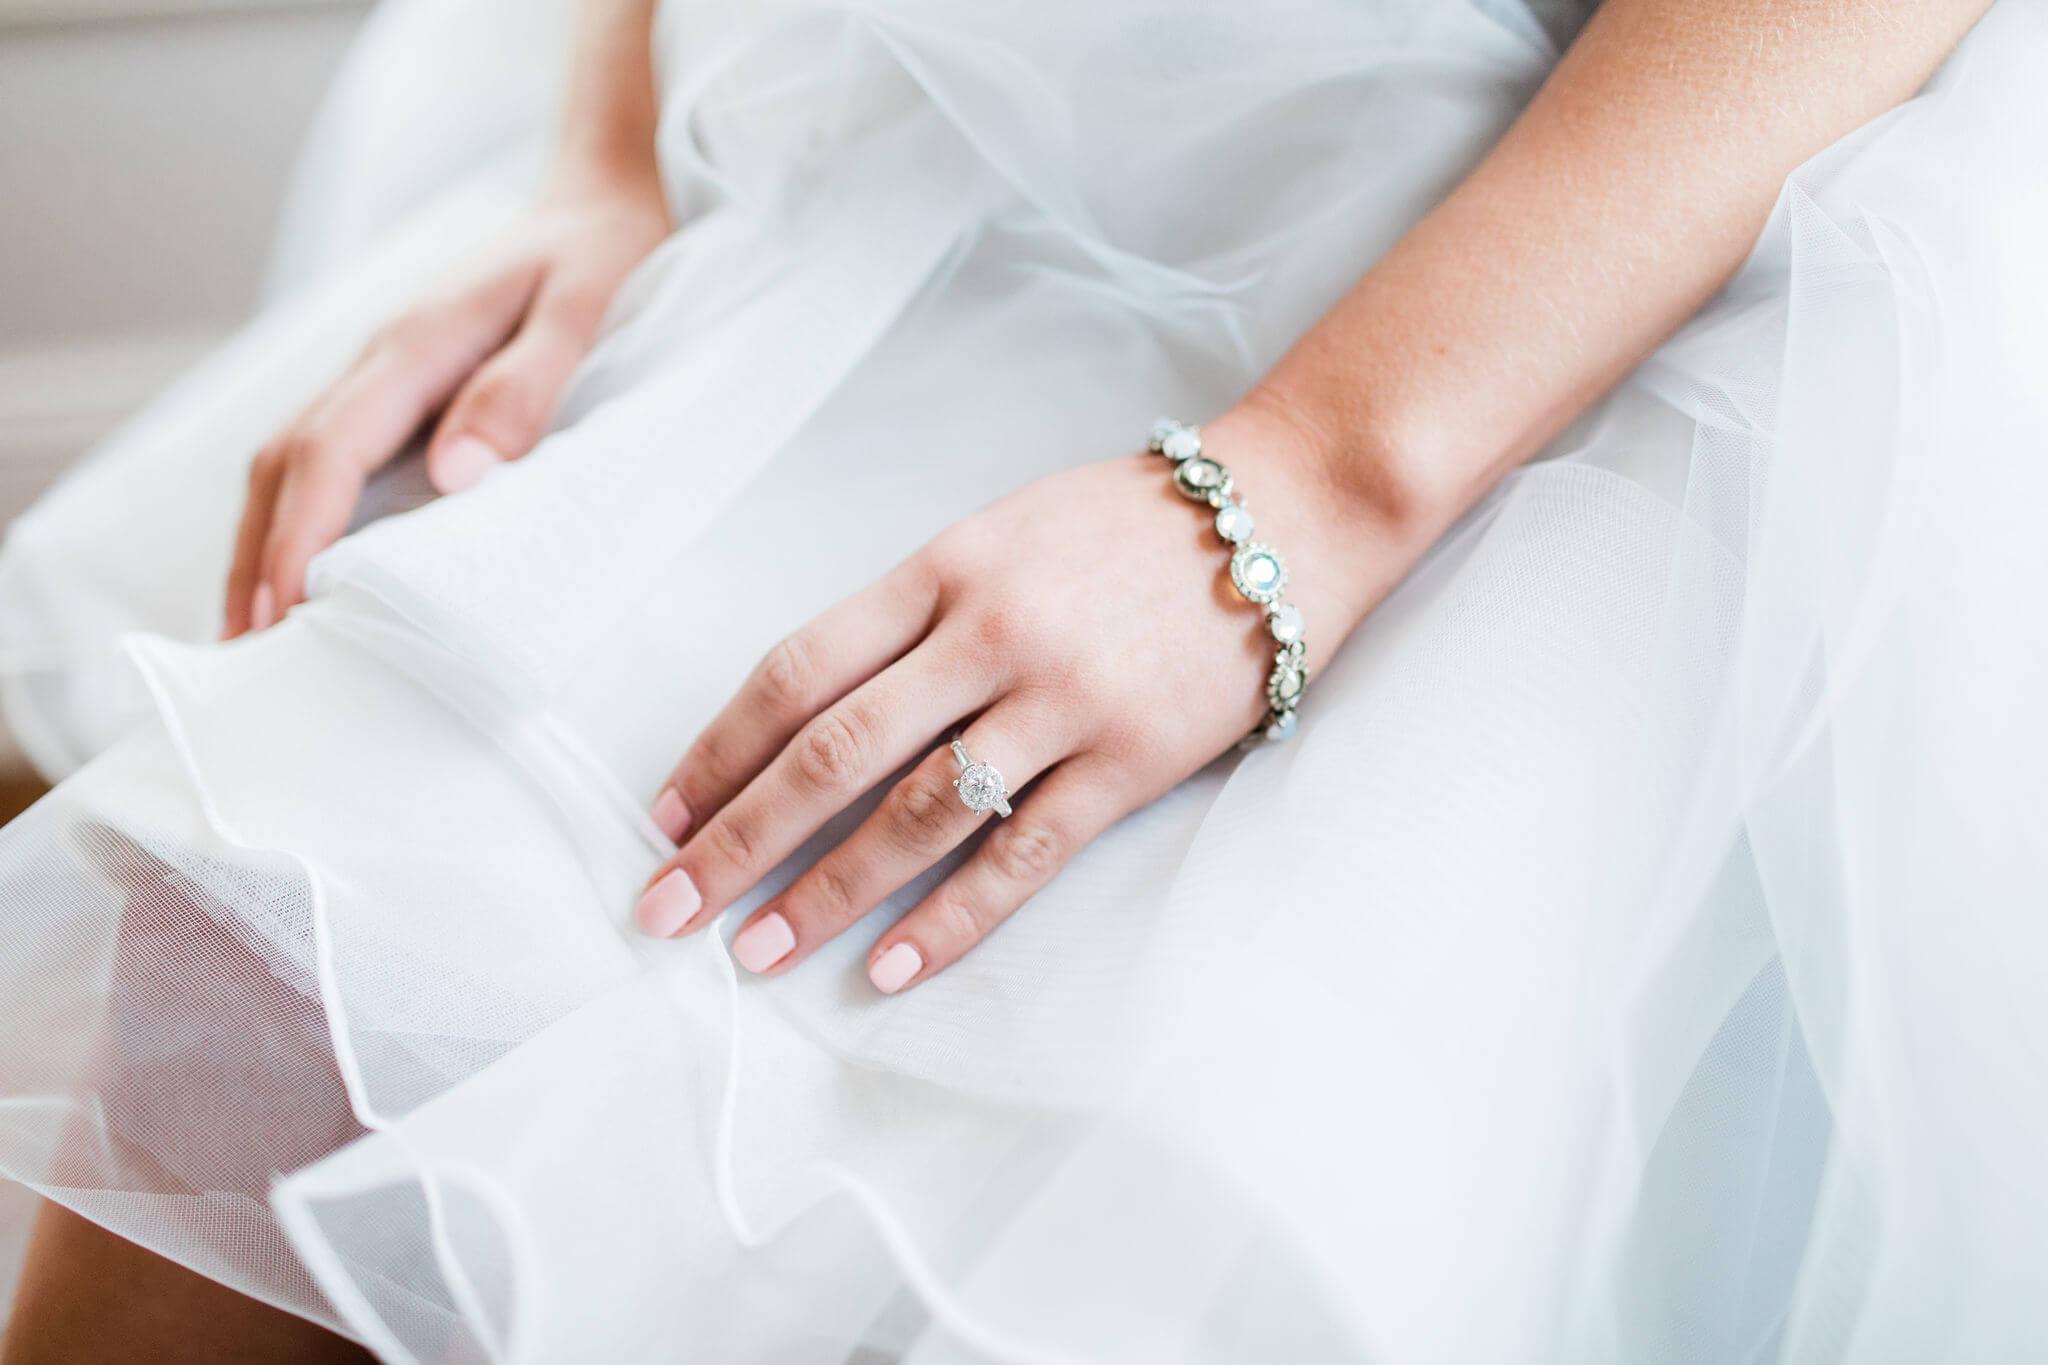 Apt-b-photography-savannah-wedding-photographer-savannah-wedding-hayley-paige-wedding-dress-intimate-wedding-photographer-28.JPG